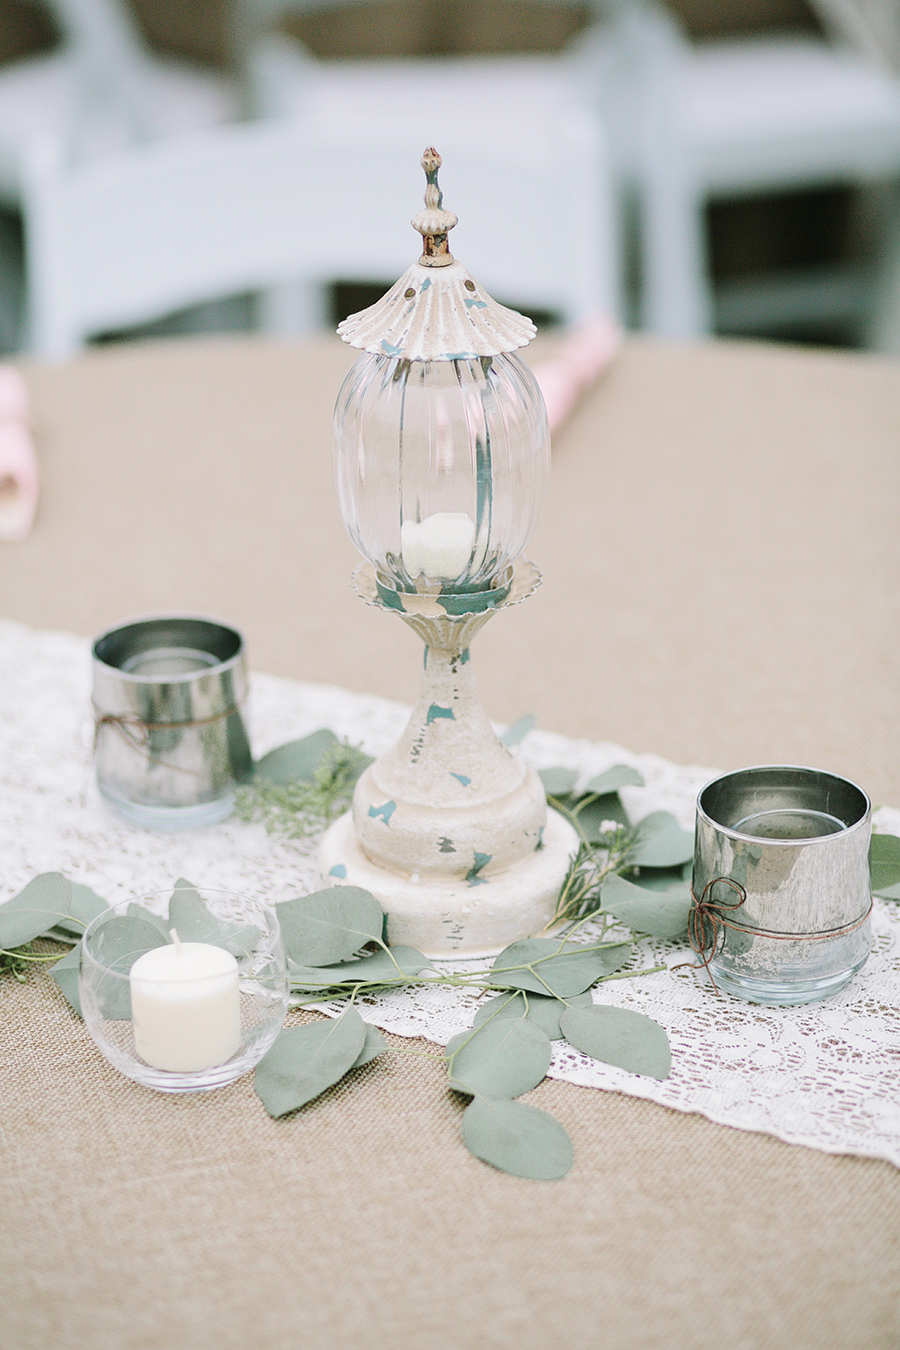 Lantern Centerpiece with Greenery